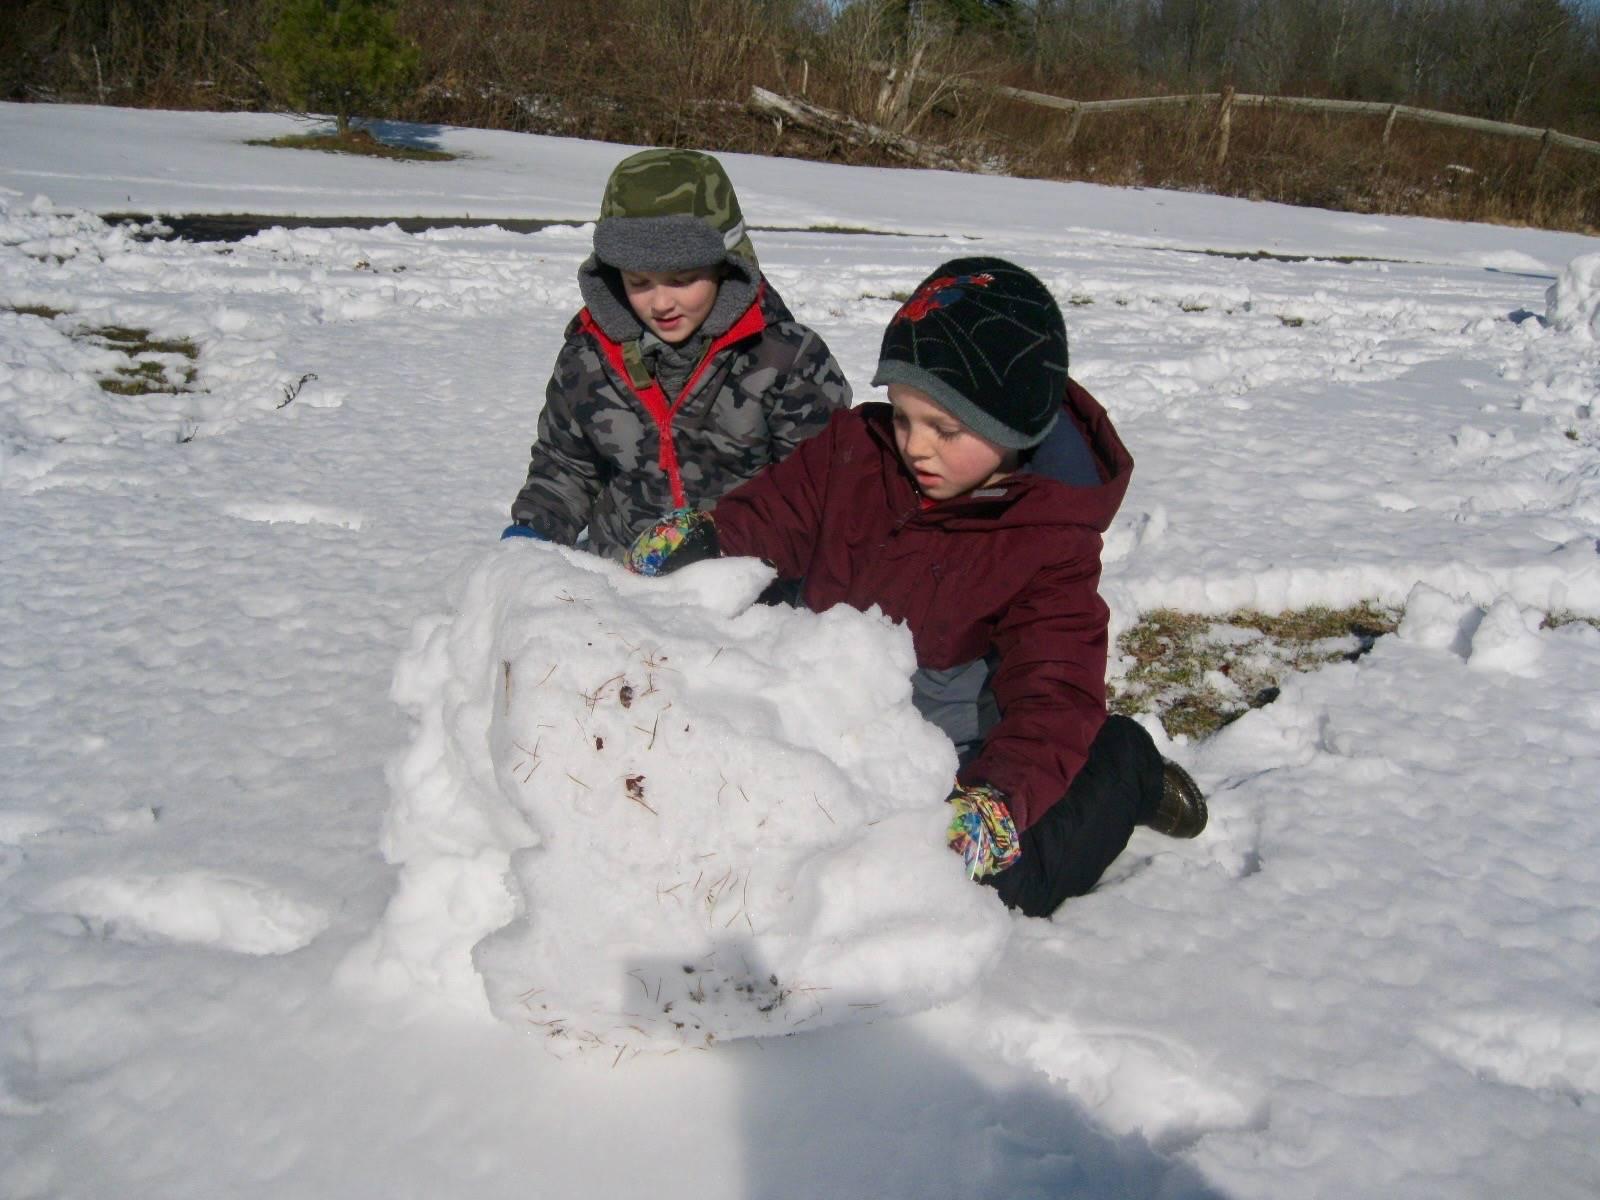 2 students pushing a snowball.